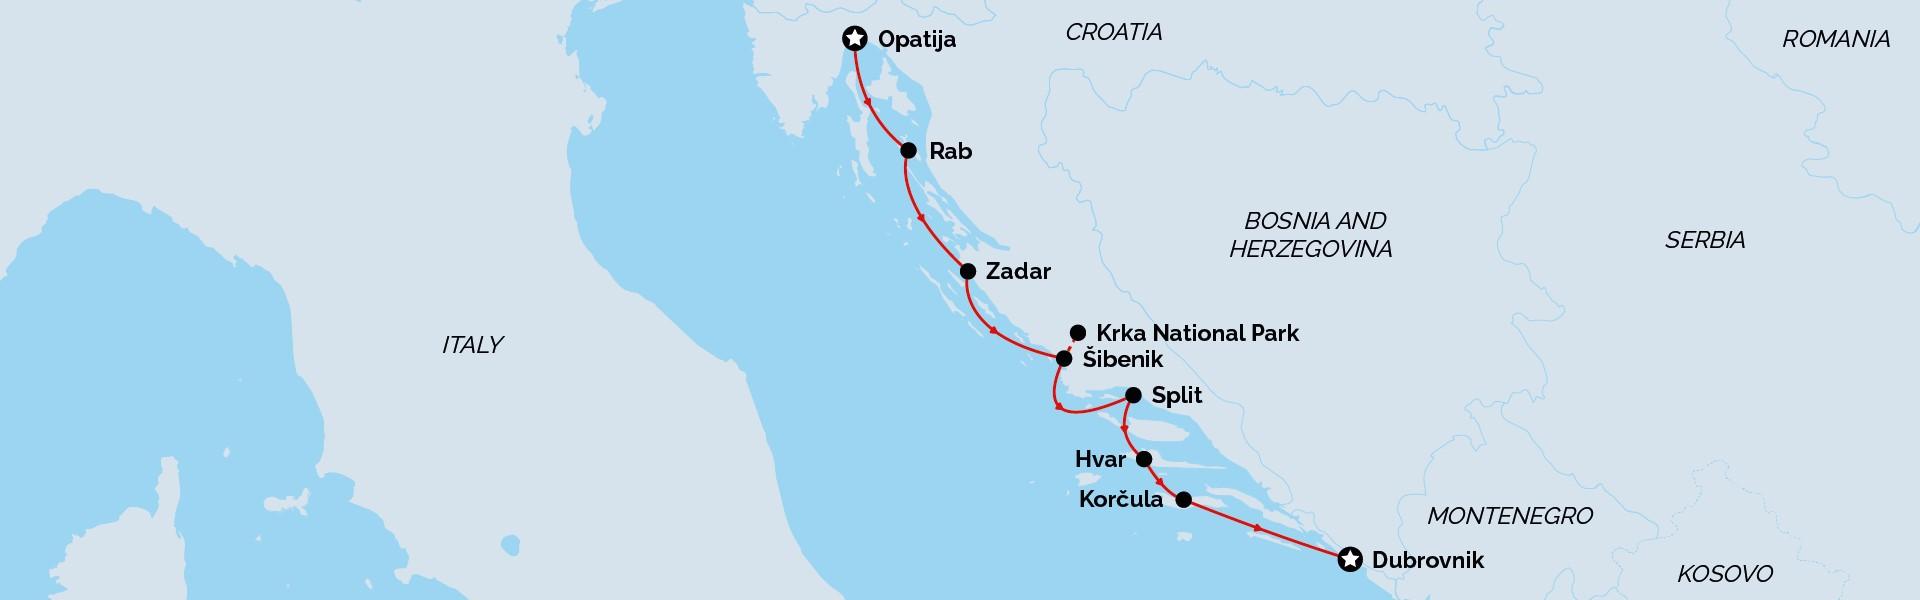 Opatija to Dubrovnik Signature Cruise